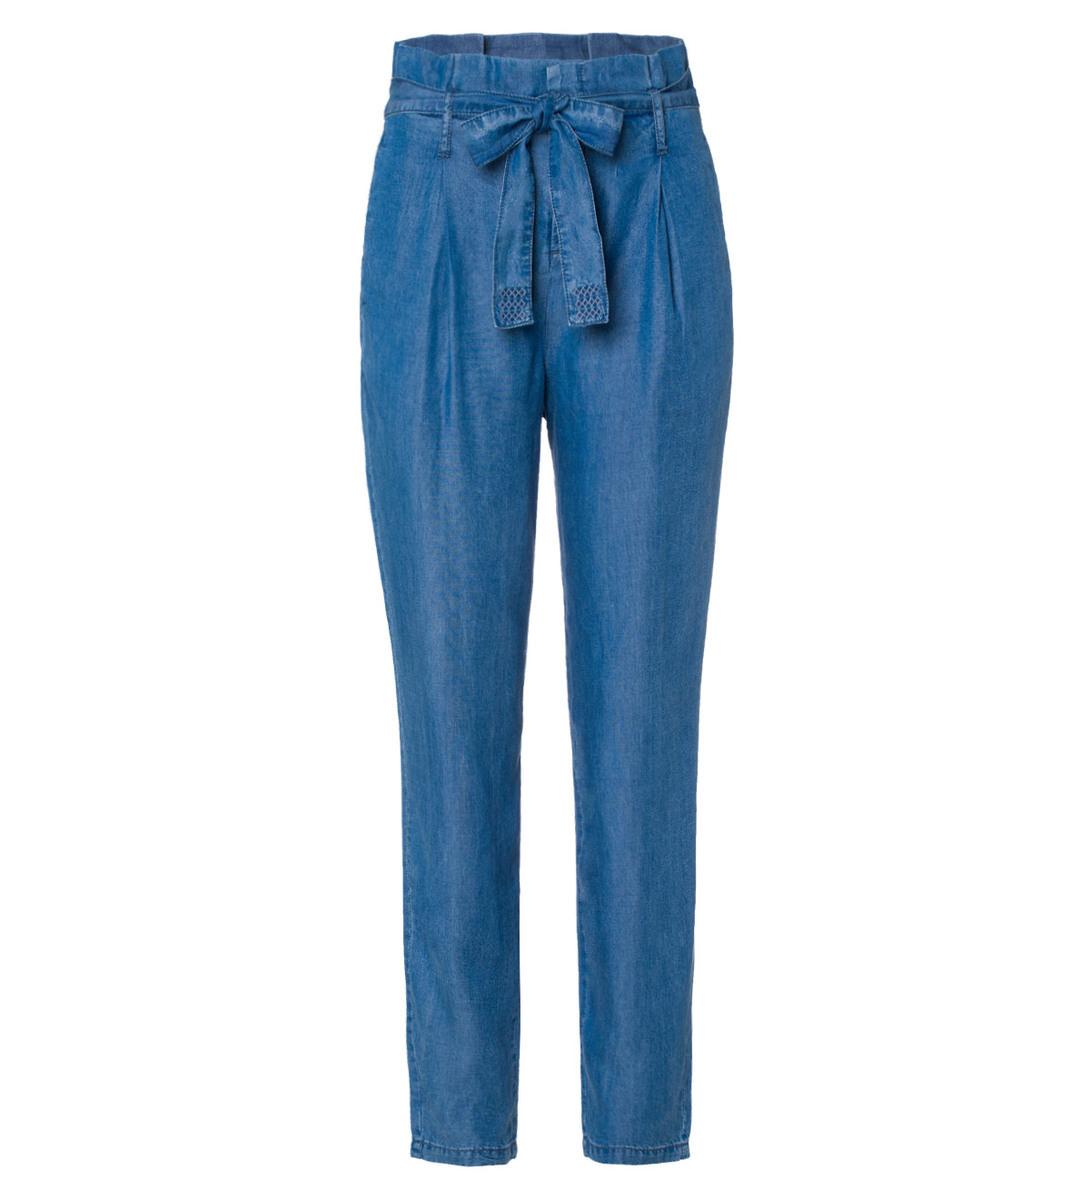 Leichte Jeanshose in light blue